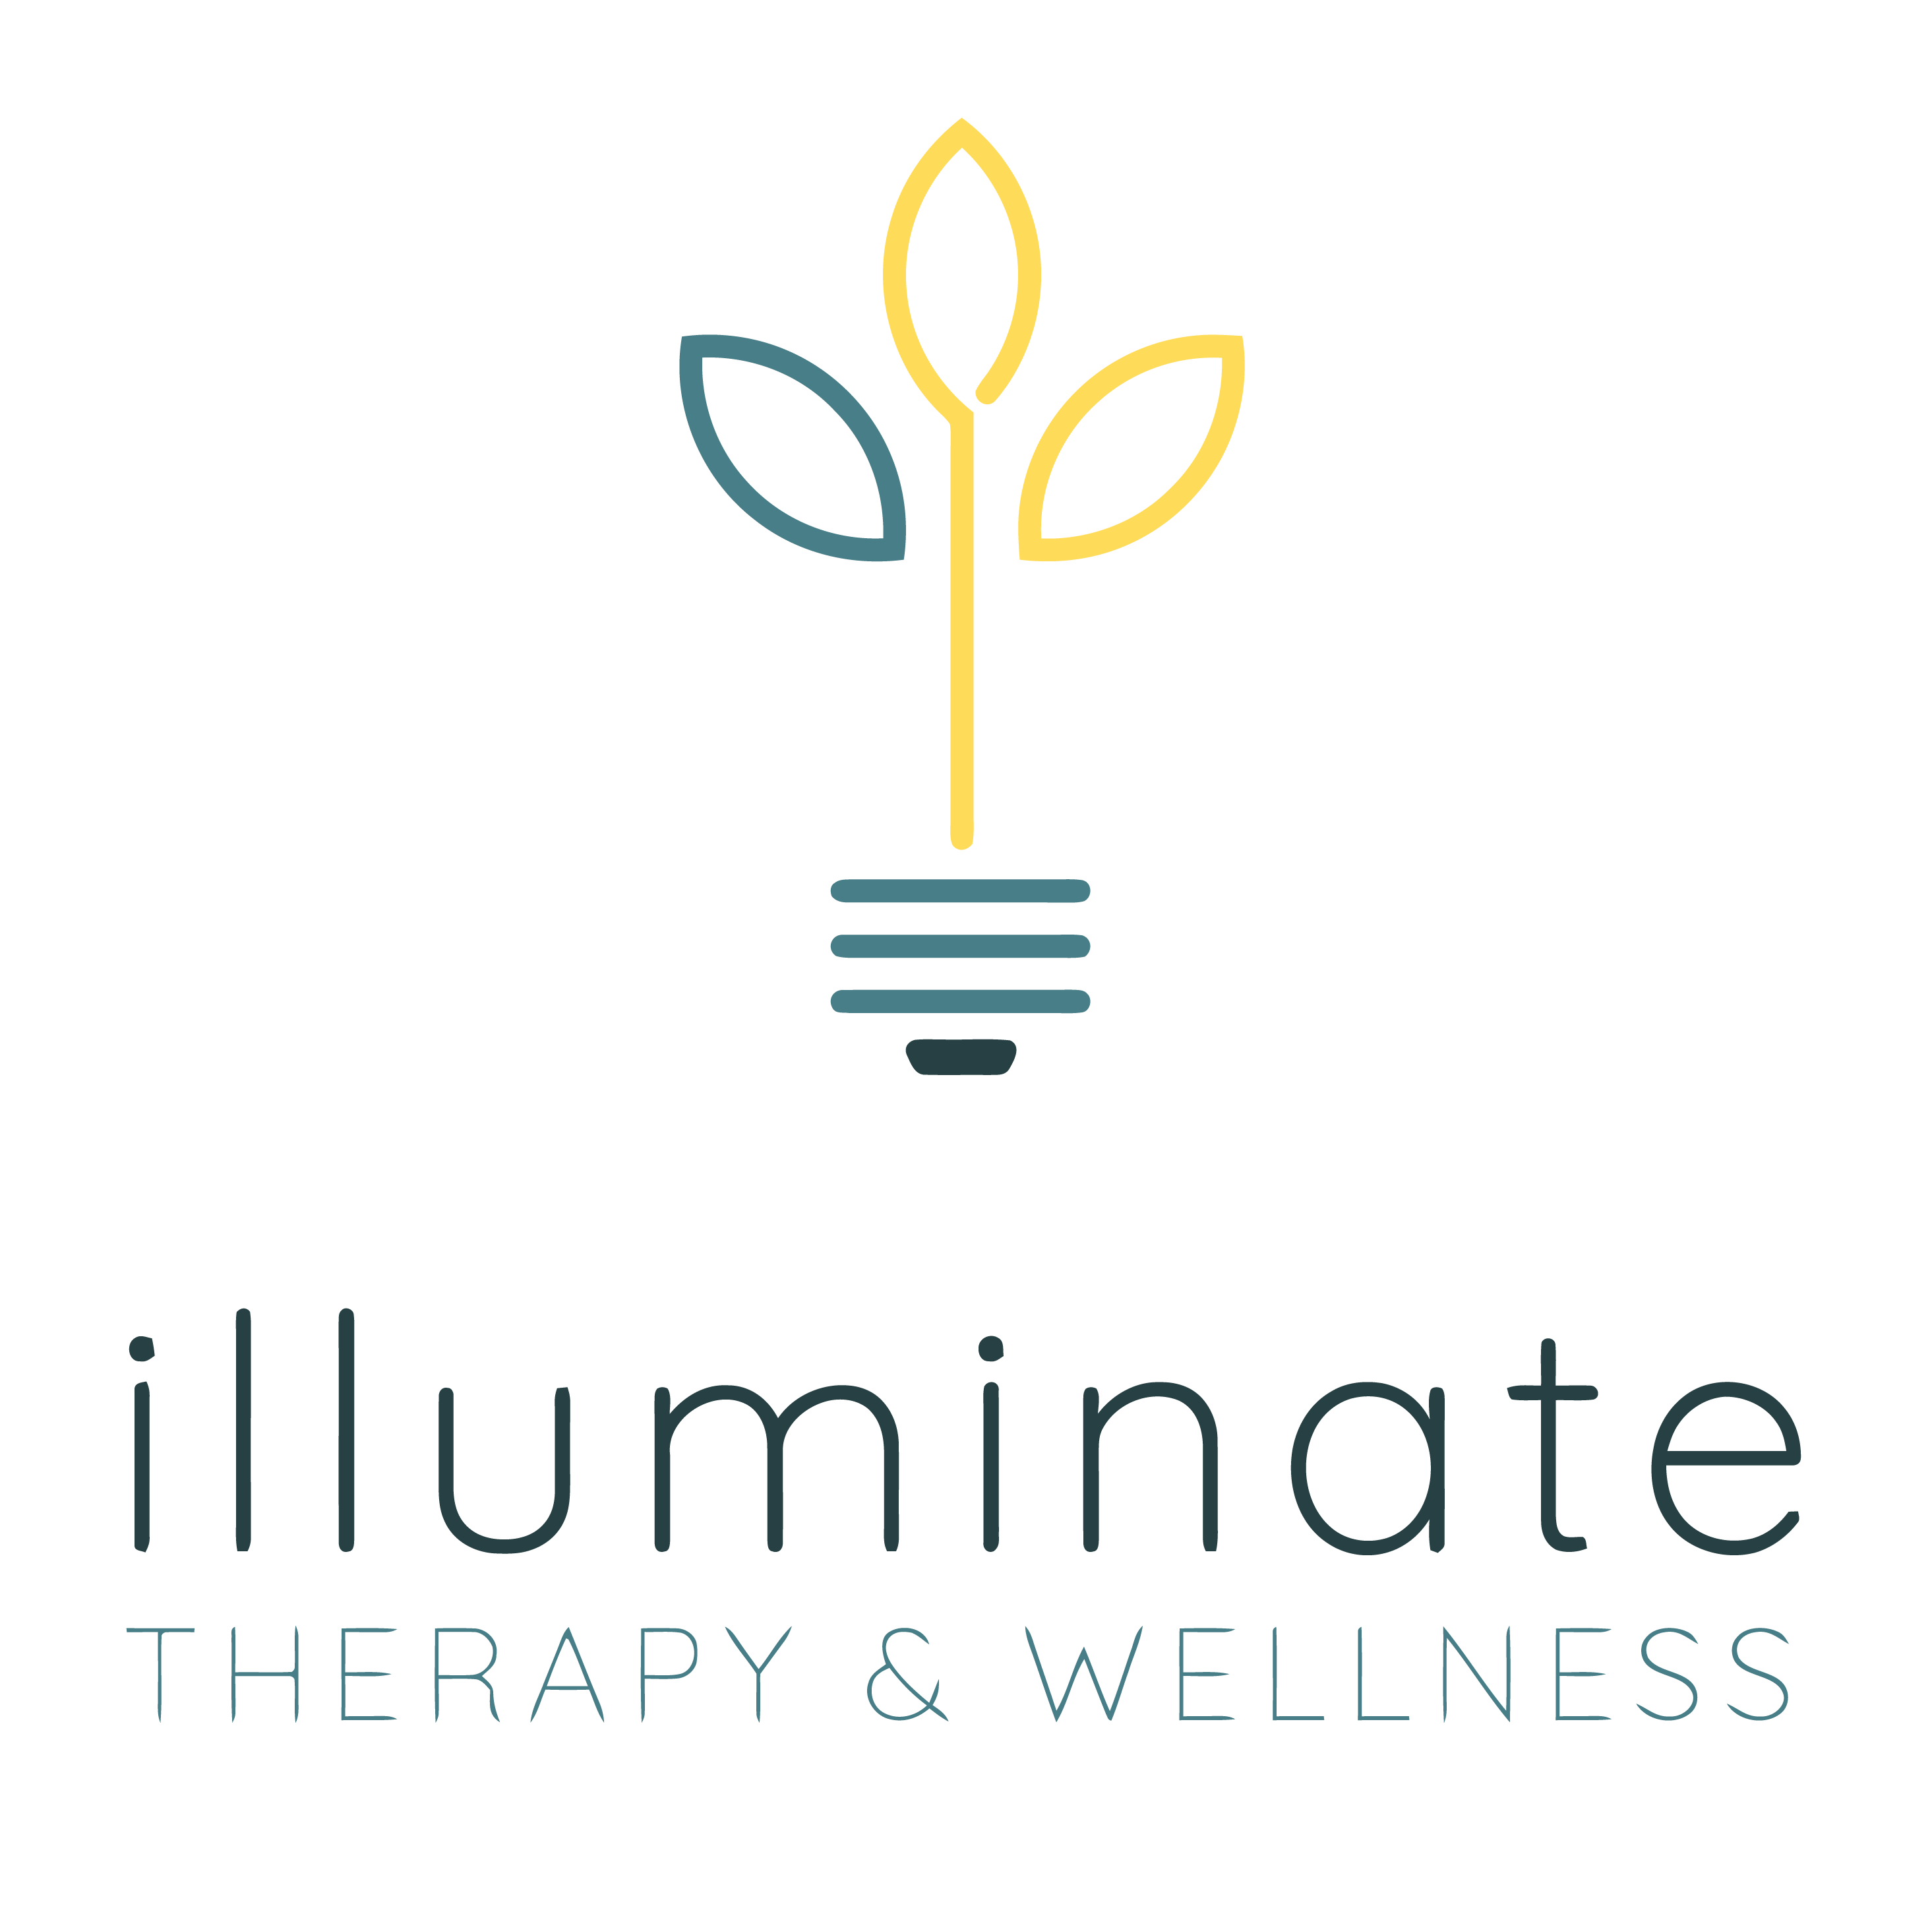 Illuminate Therapy & Wellness